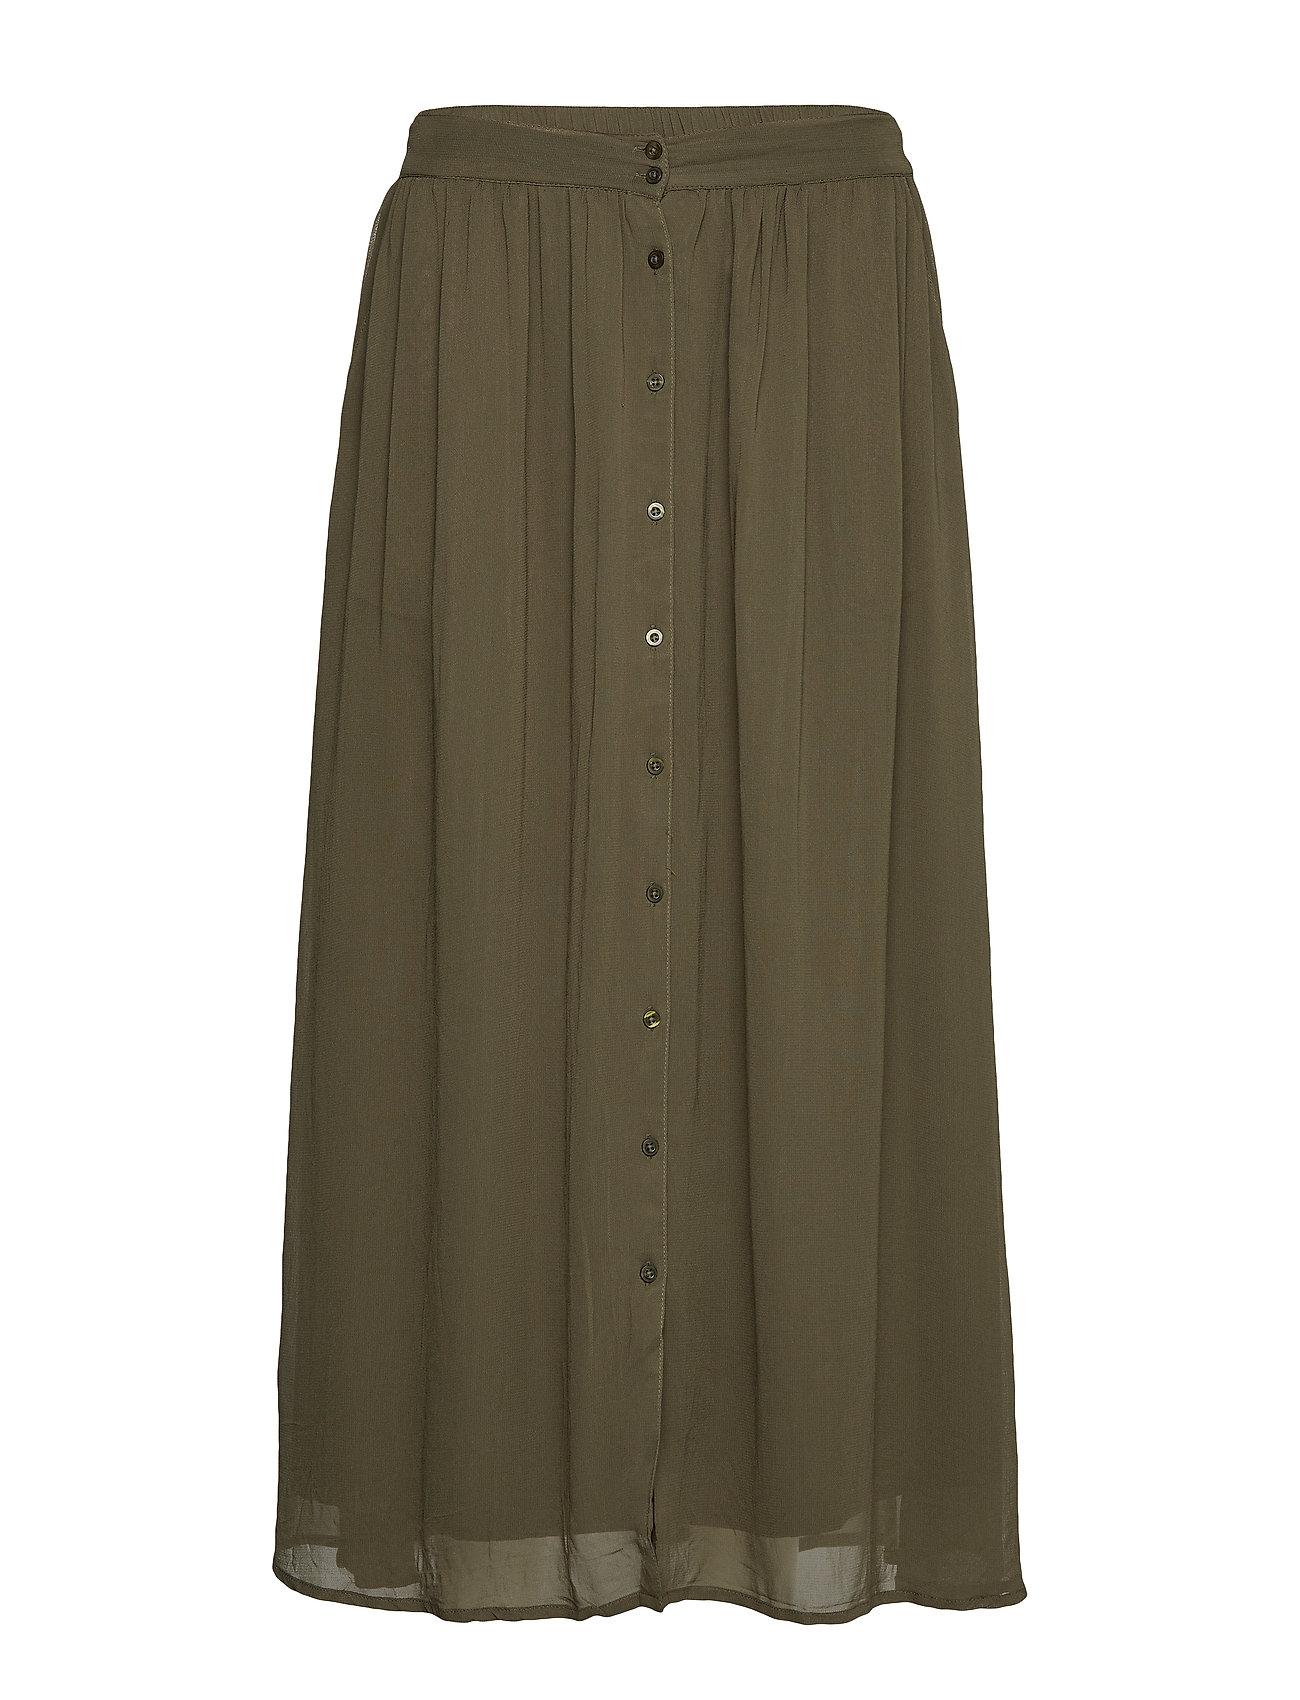 Soft Rebels Koon Maxi Skirt - GRAPE LEAF